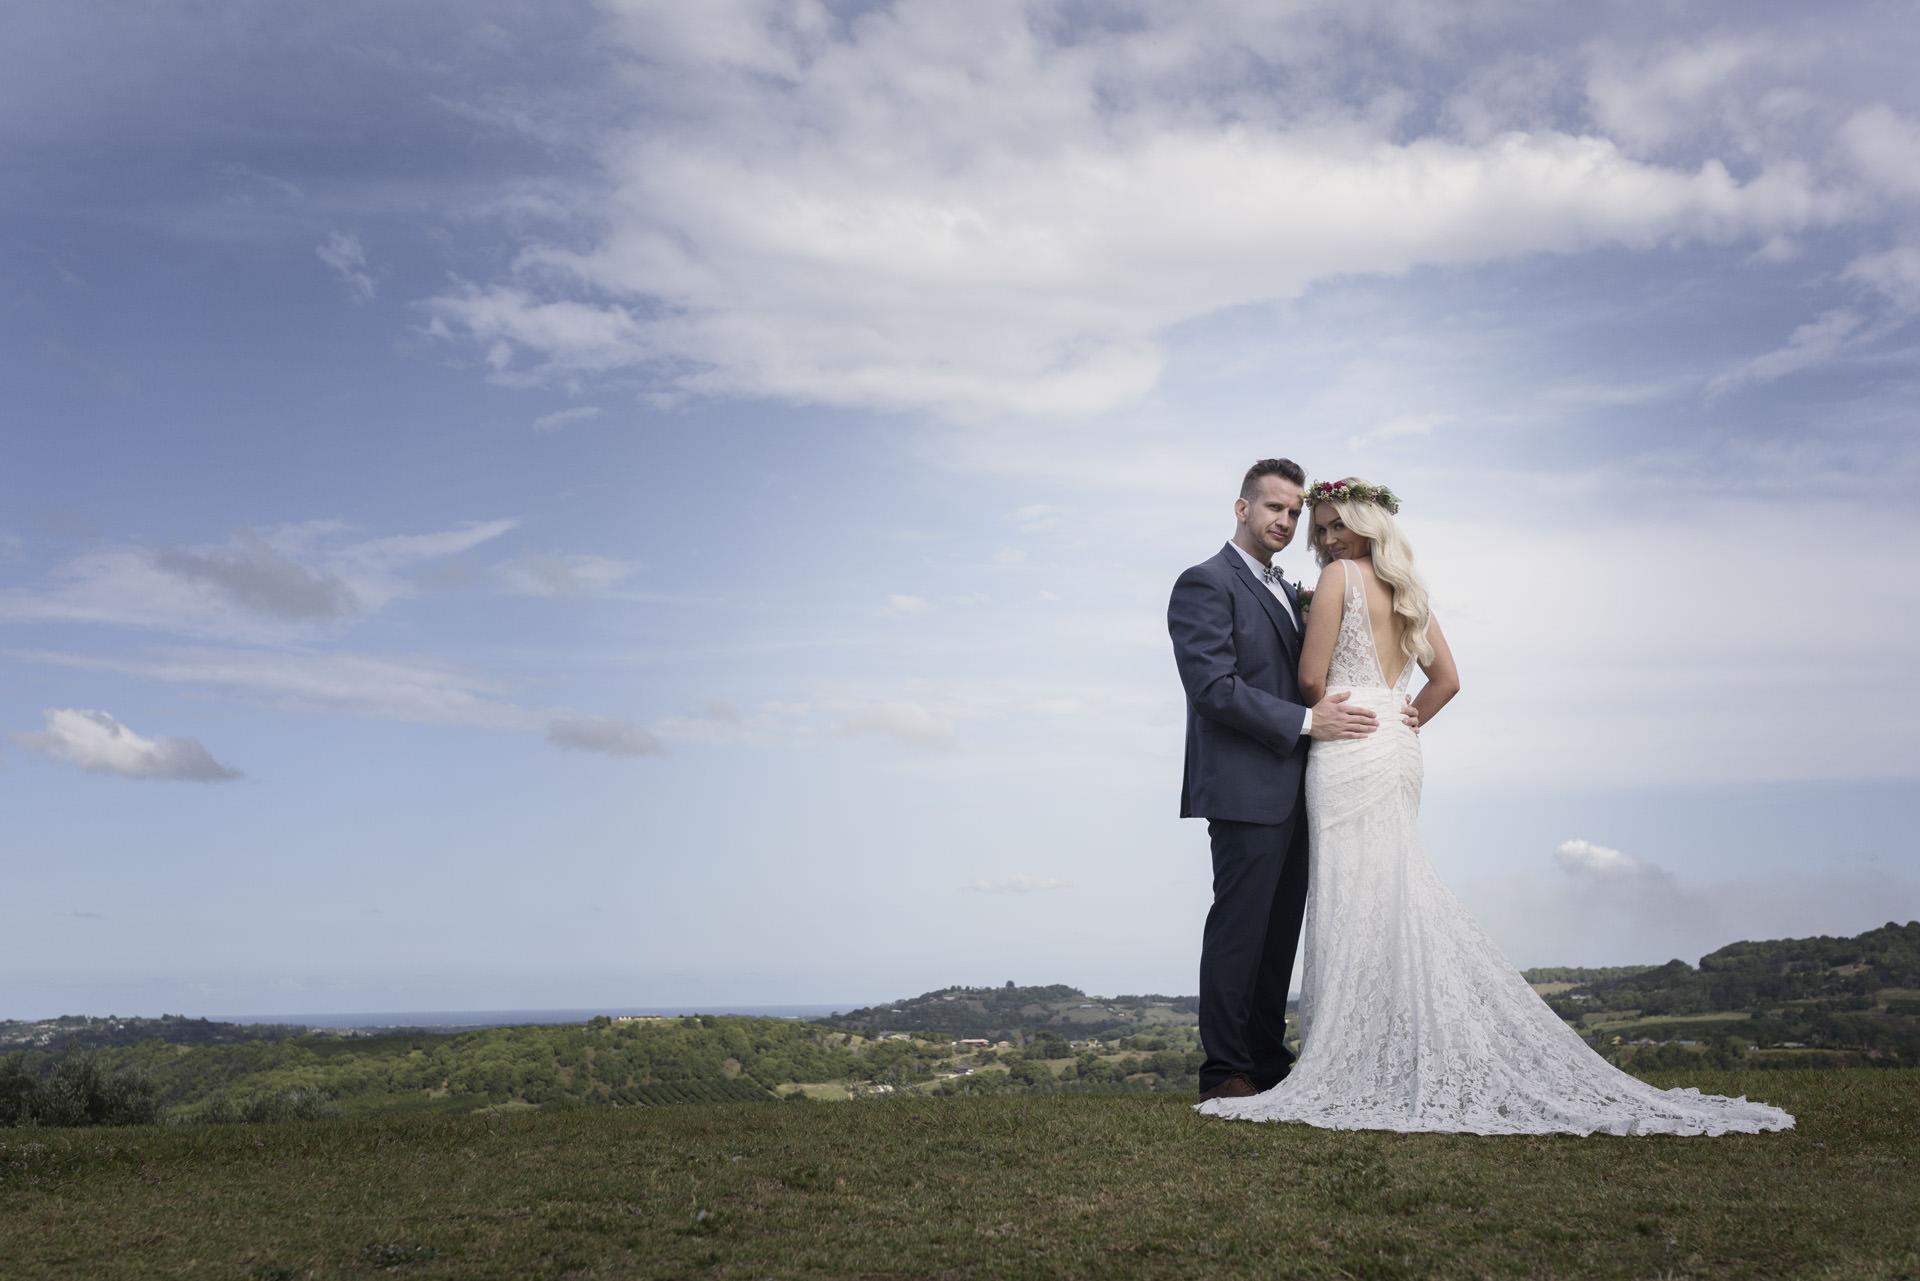 Summergrove Estate Wedding Photography